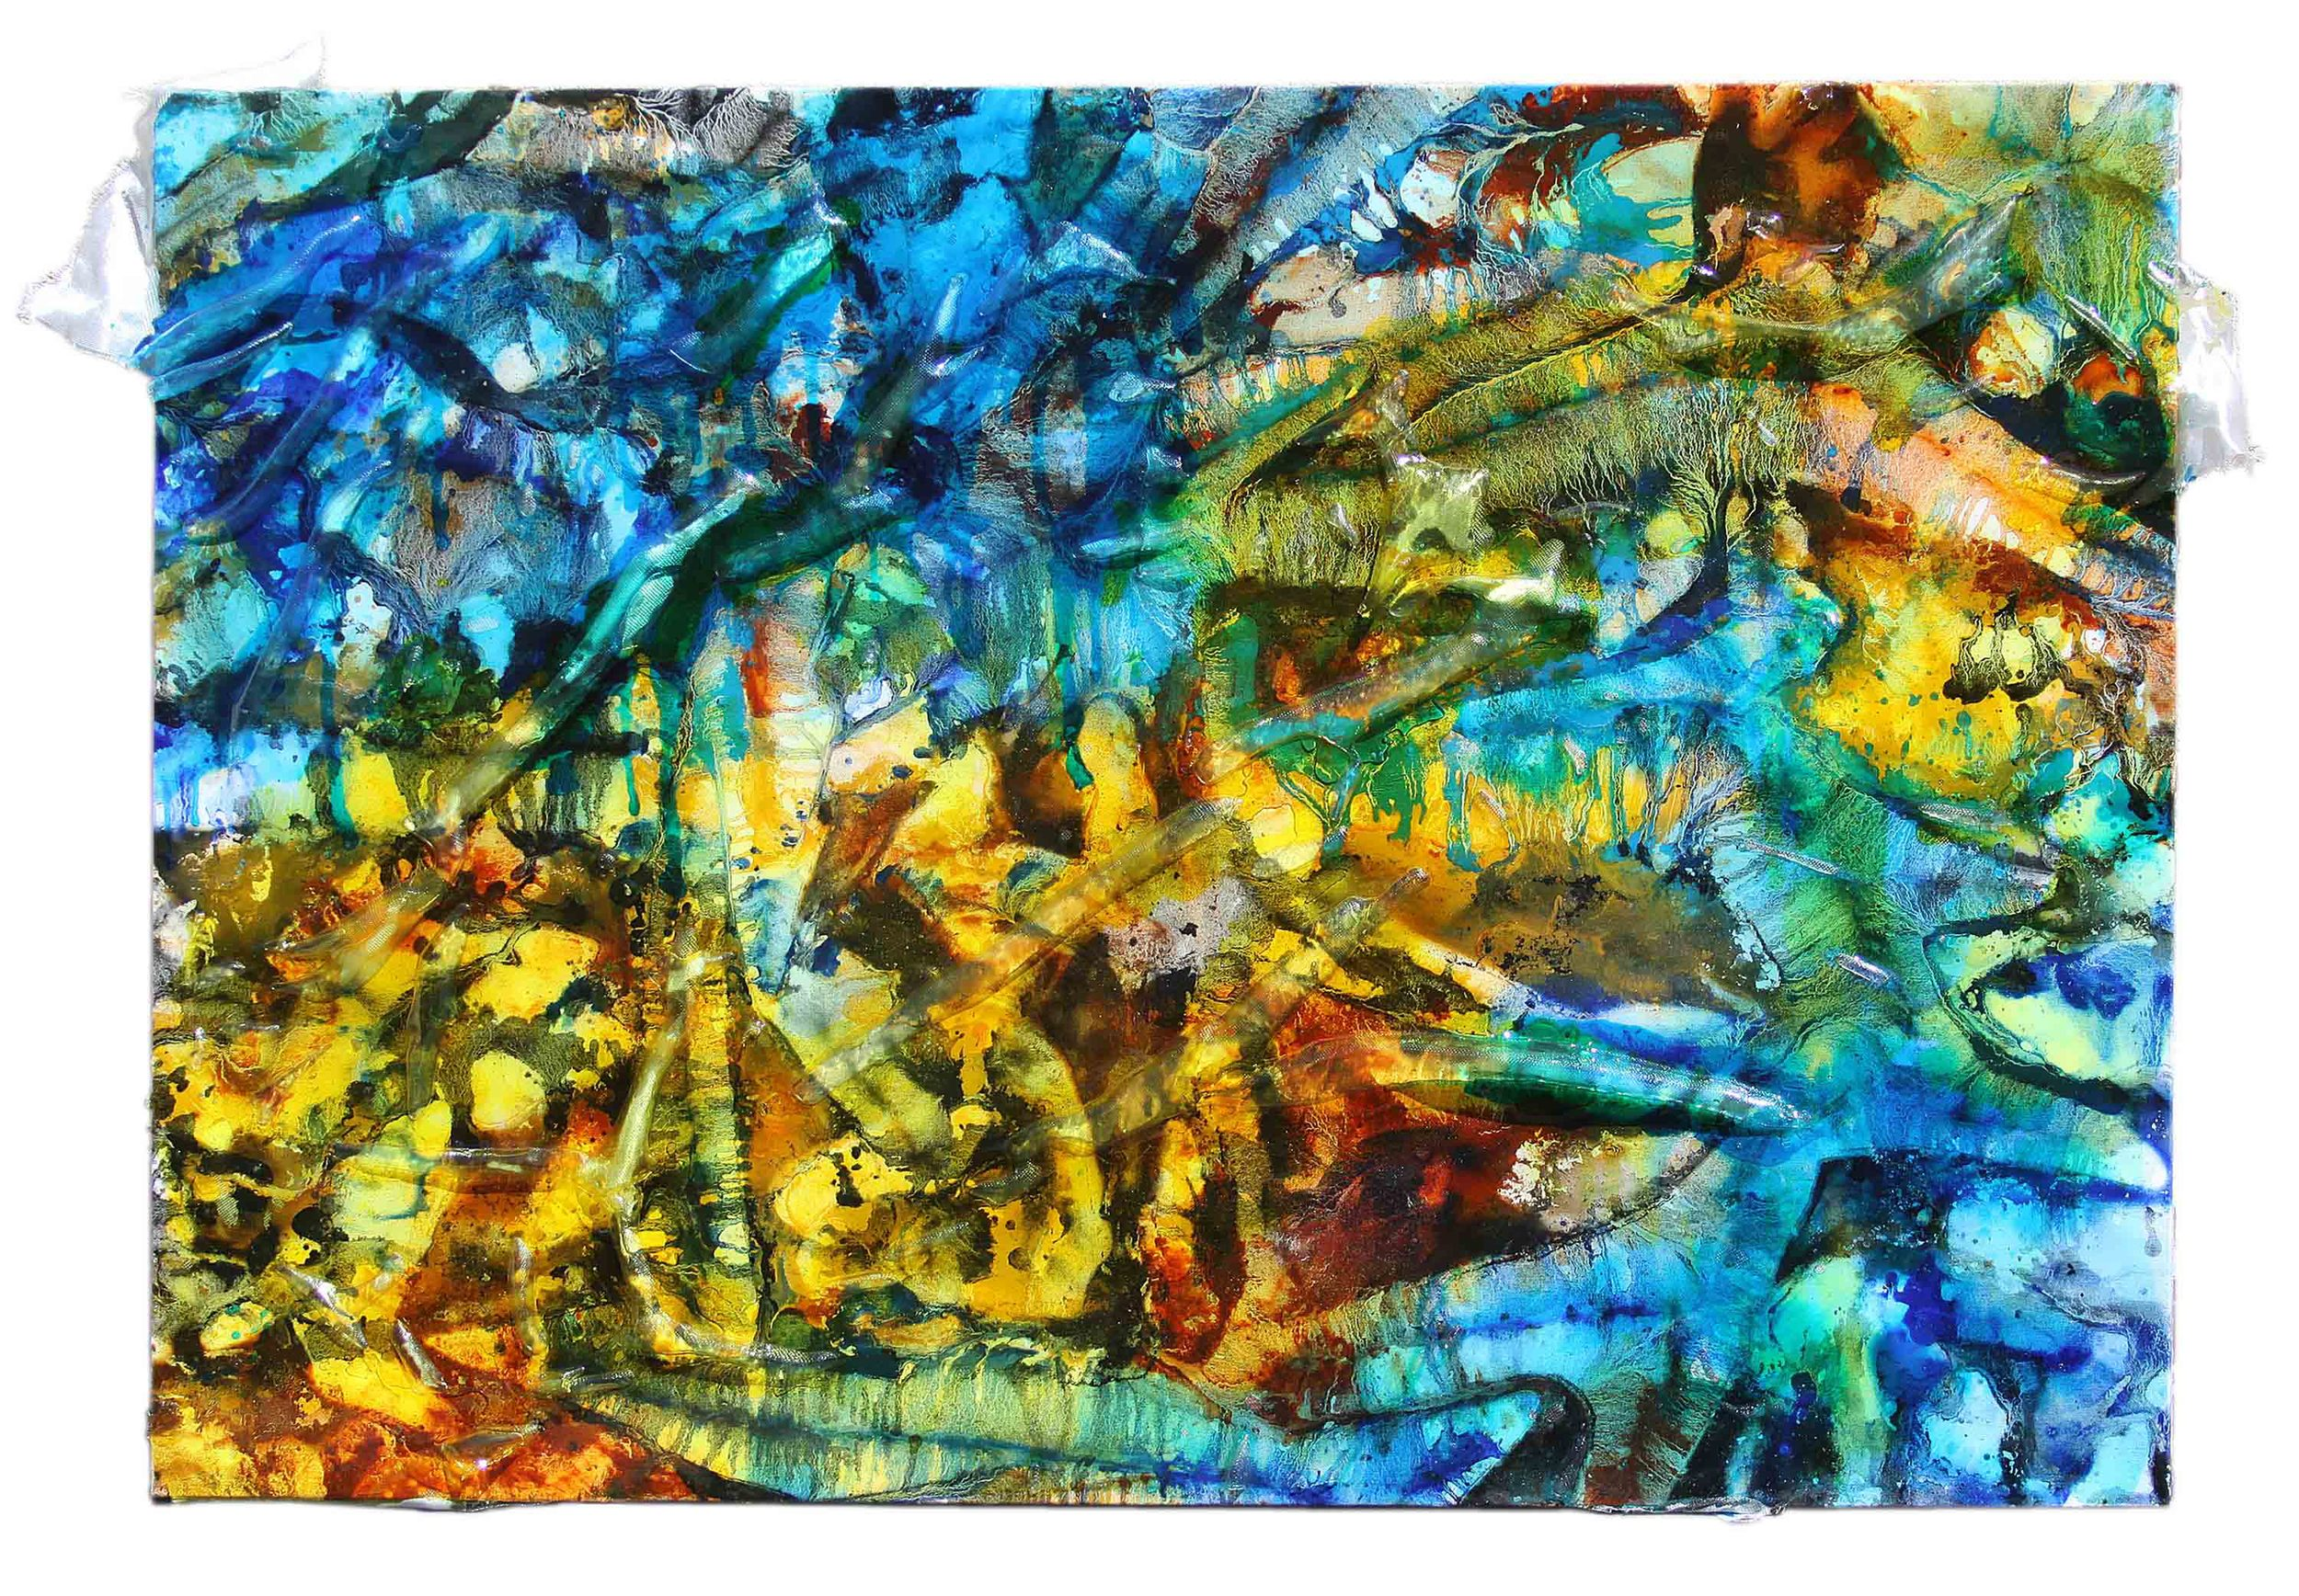 Tidepools Herbie Fletcher Resin Painting IMG_5902-C-S-LR.jpg